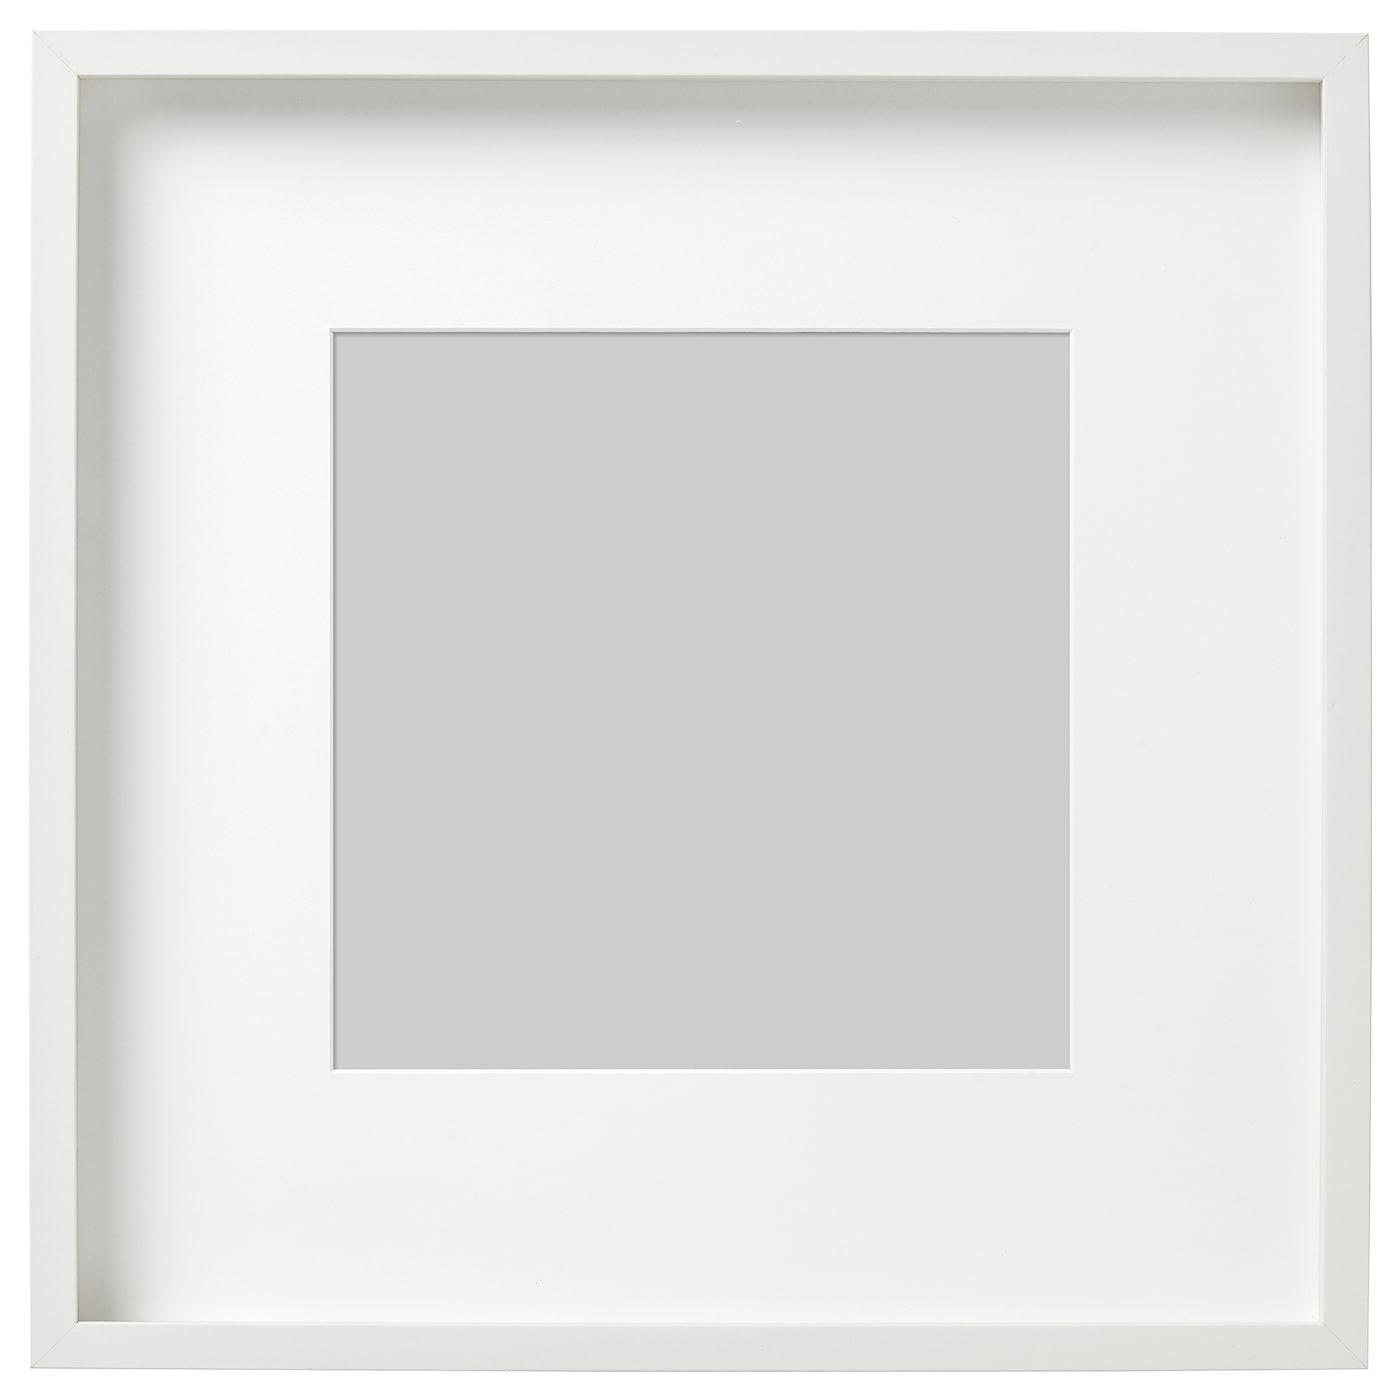 RIBBA Marco Blanco 50 x 50 cm - IKEA